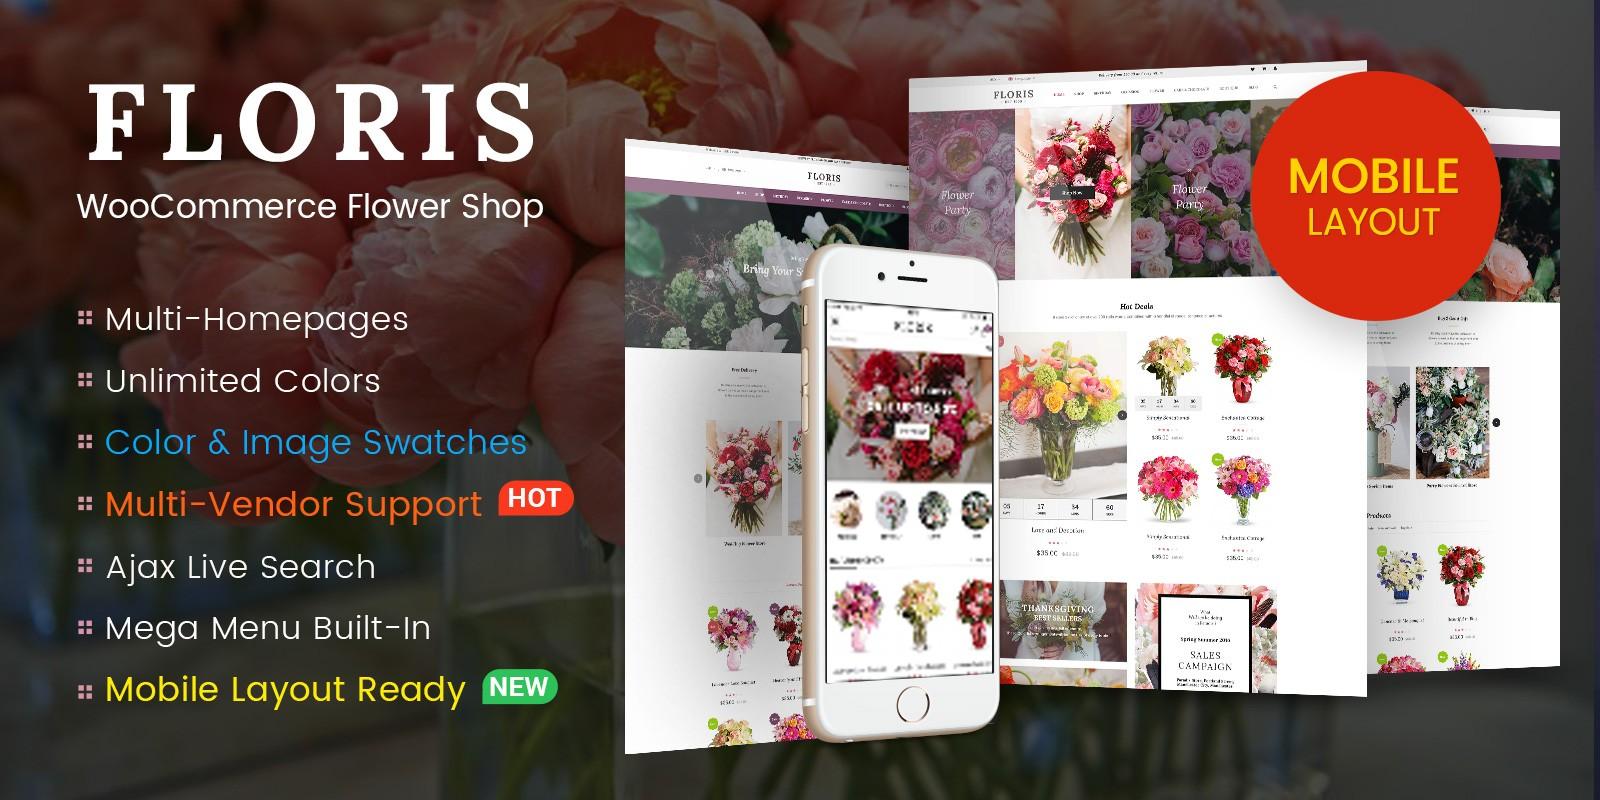 Floris - WooCommerce Flower Shop WordPress Theme